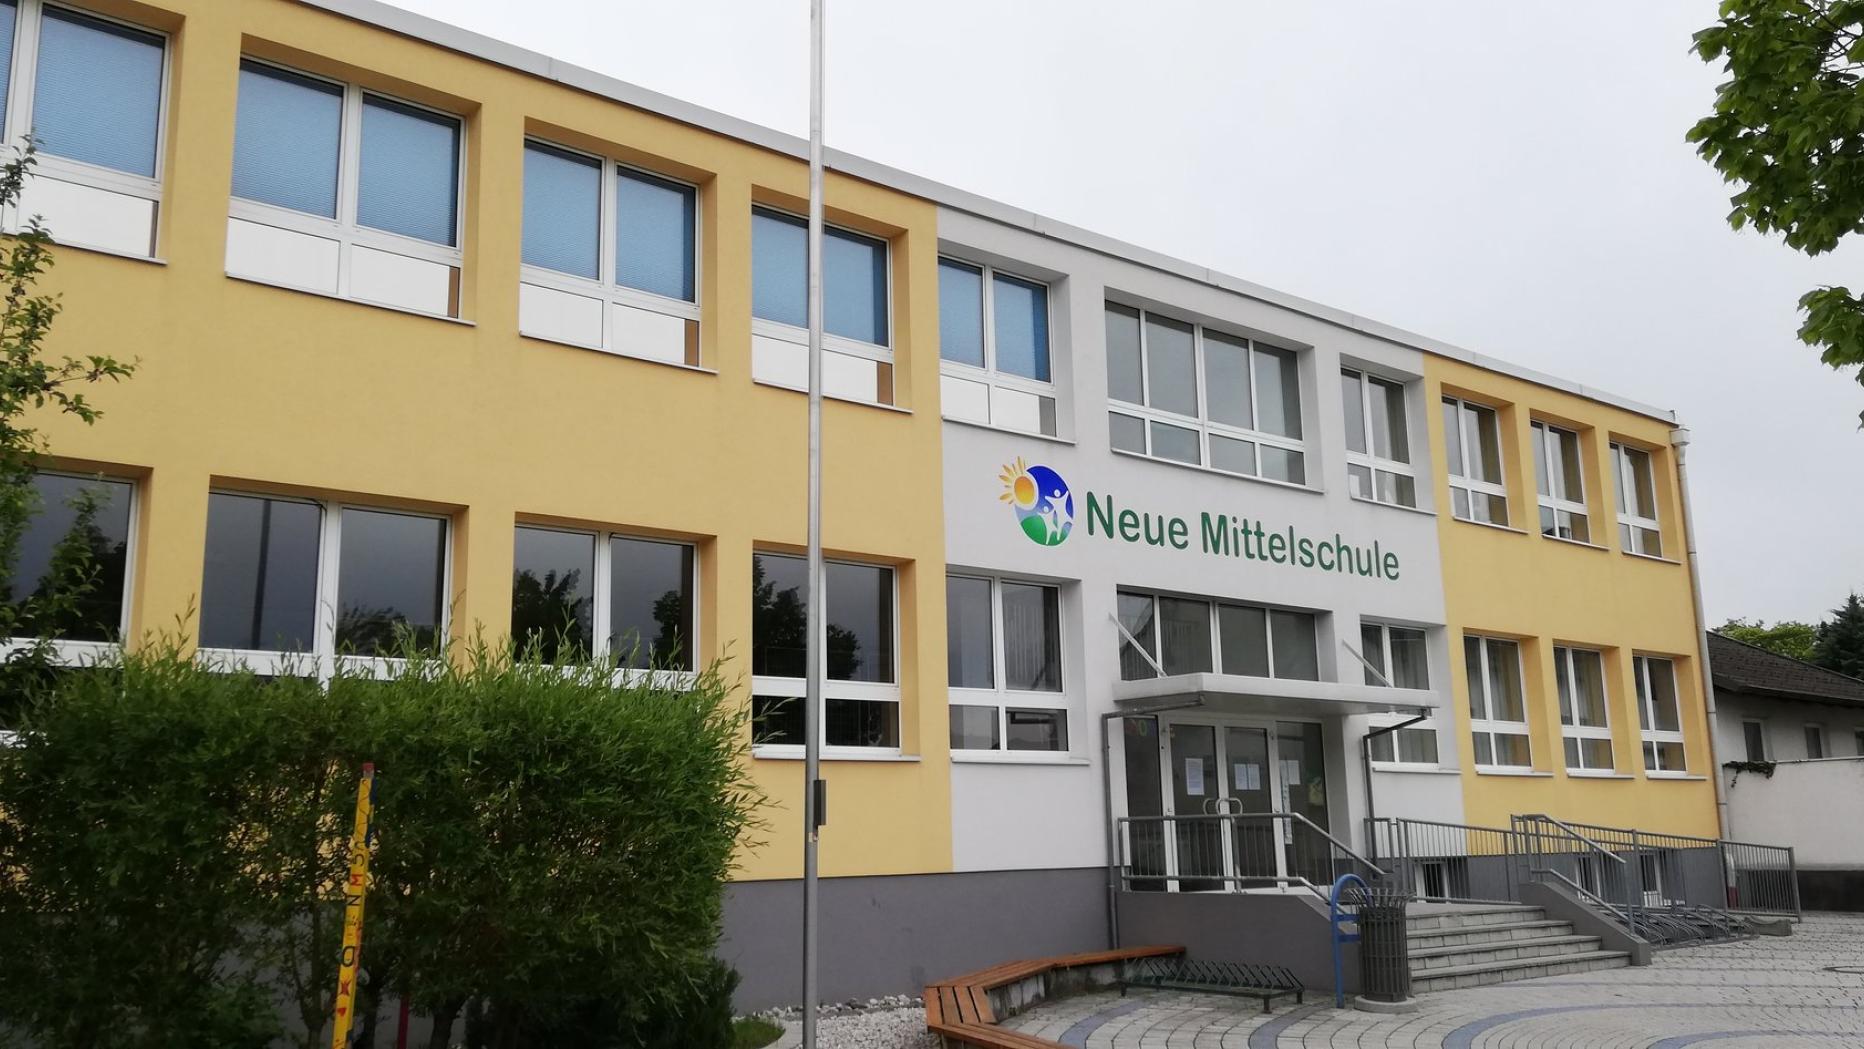 Bekanntschaften in Schattendorf - Partnersuche & Kontakte